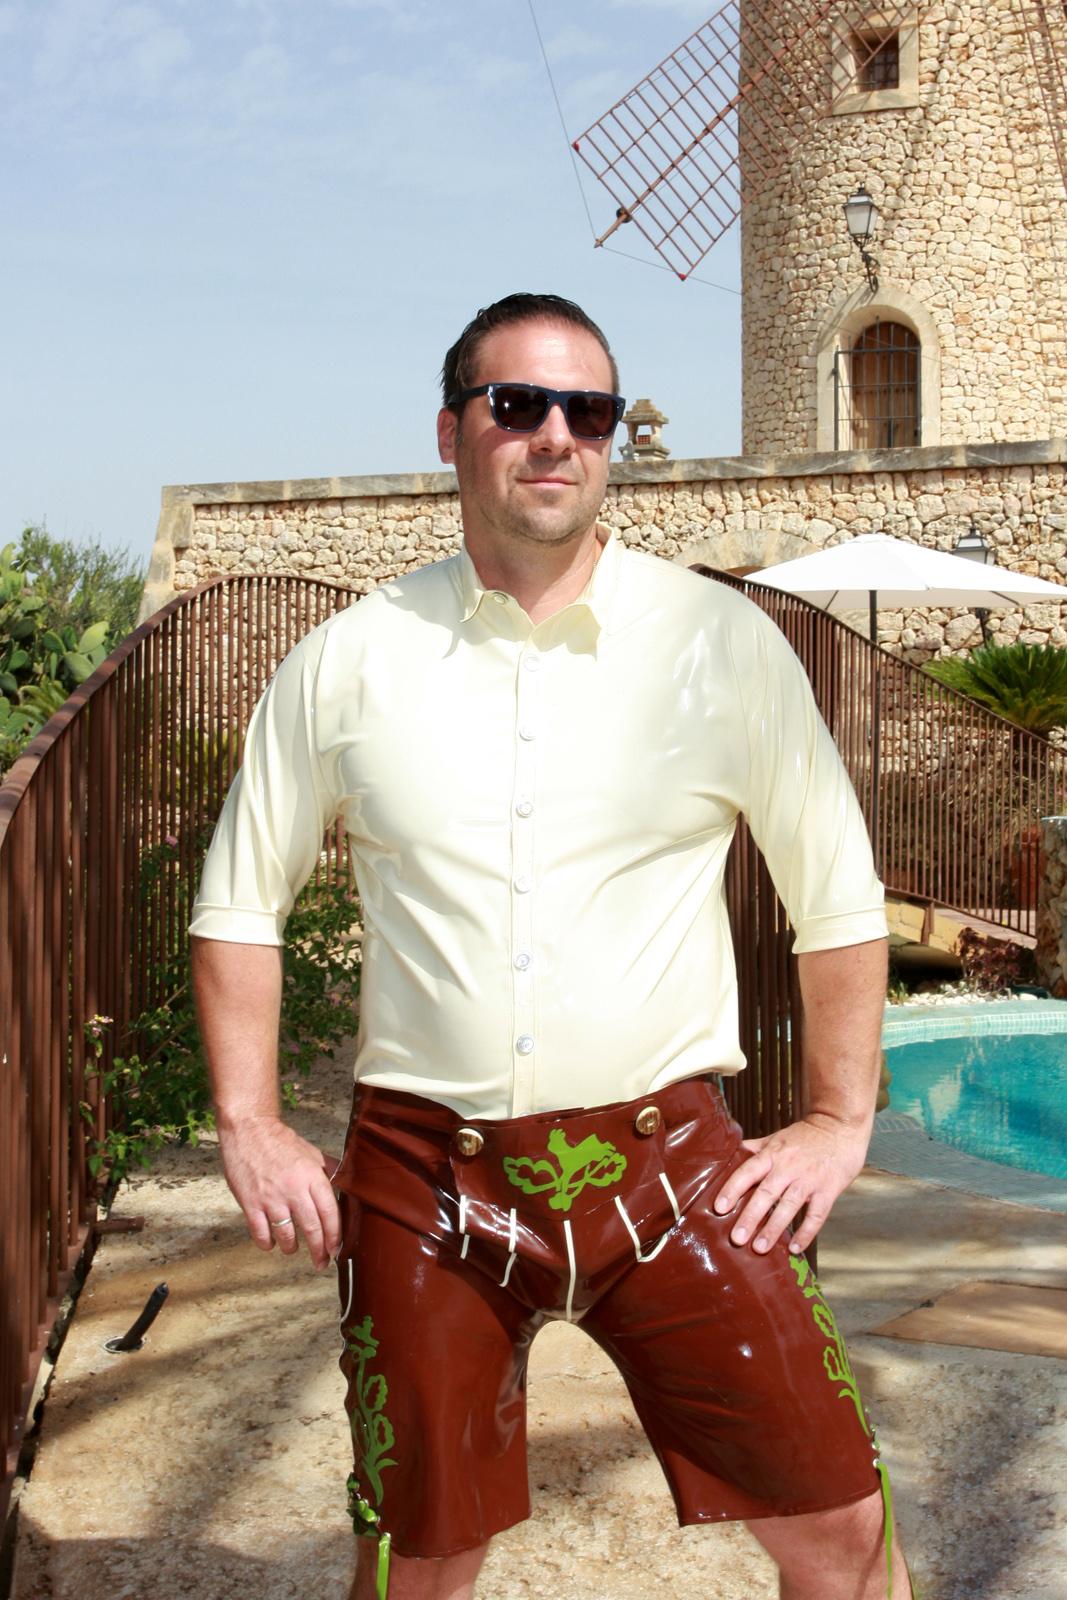 Latex Shirt Mister Oktoberfest